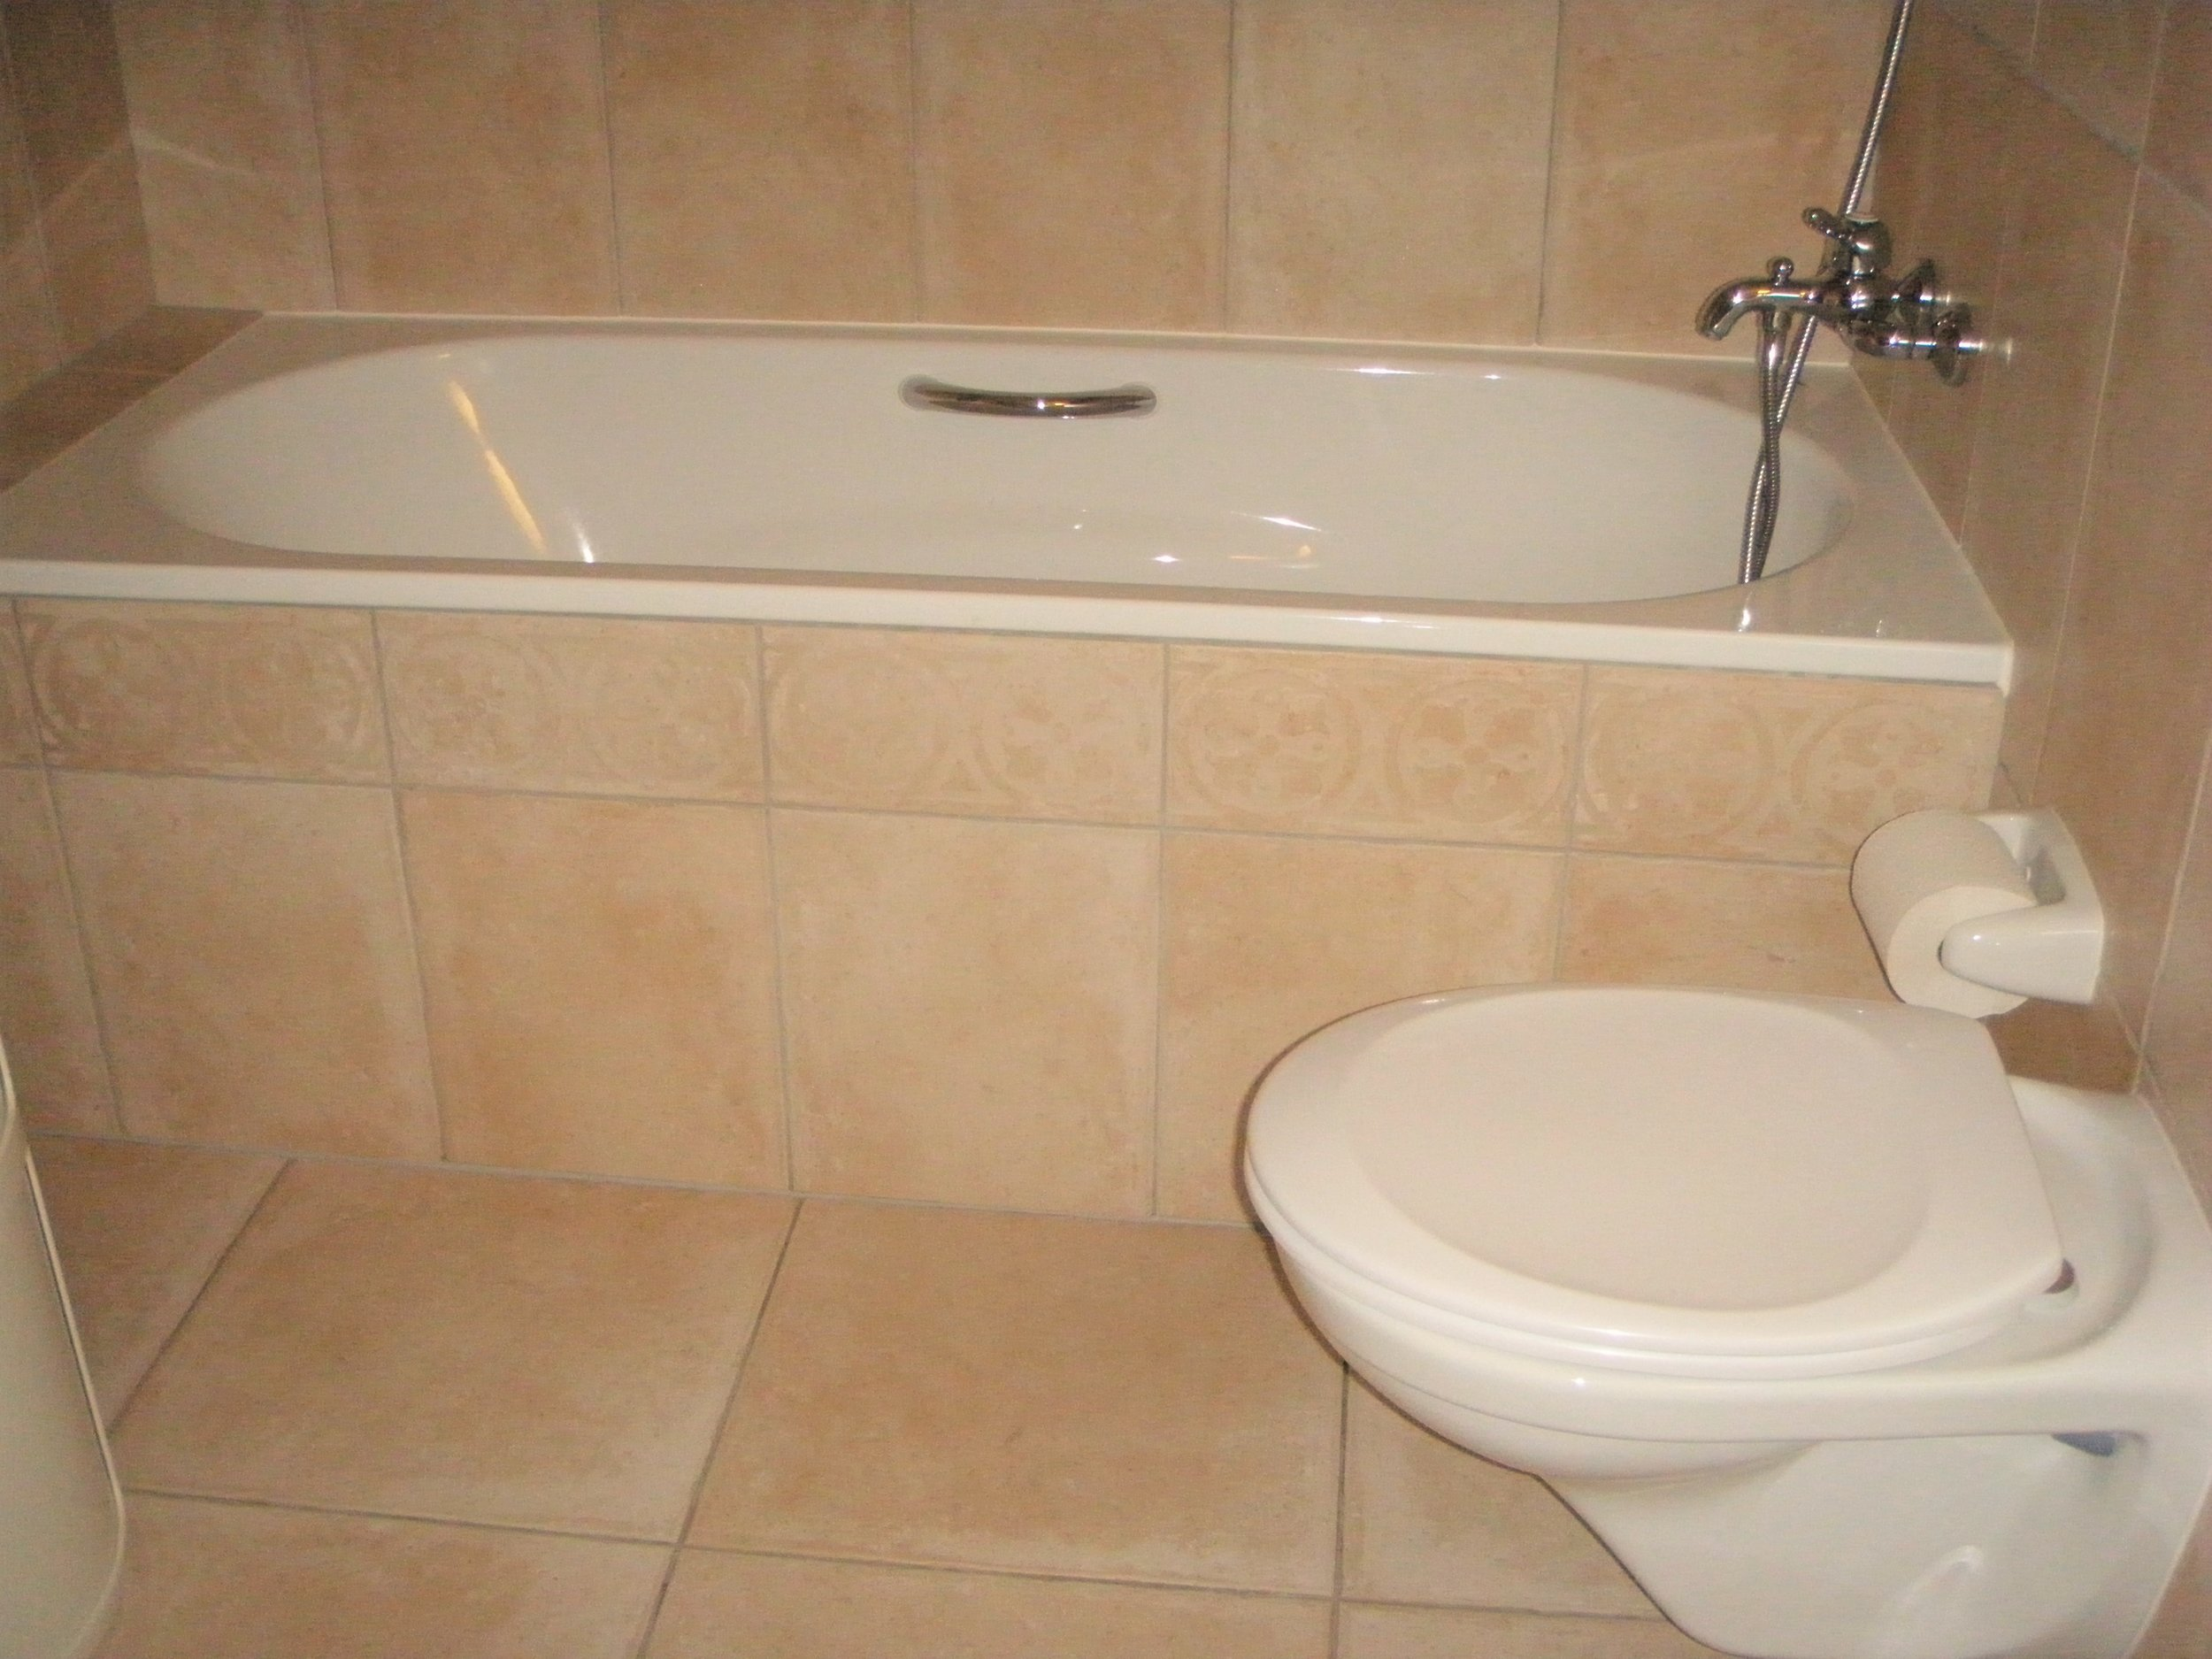 bathroom tub and toilet.jpg